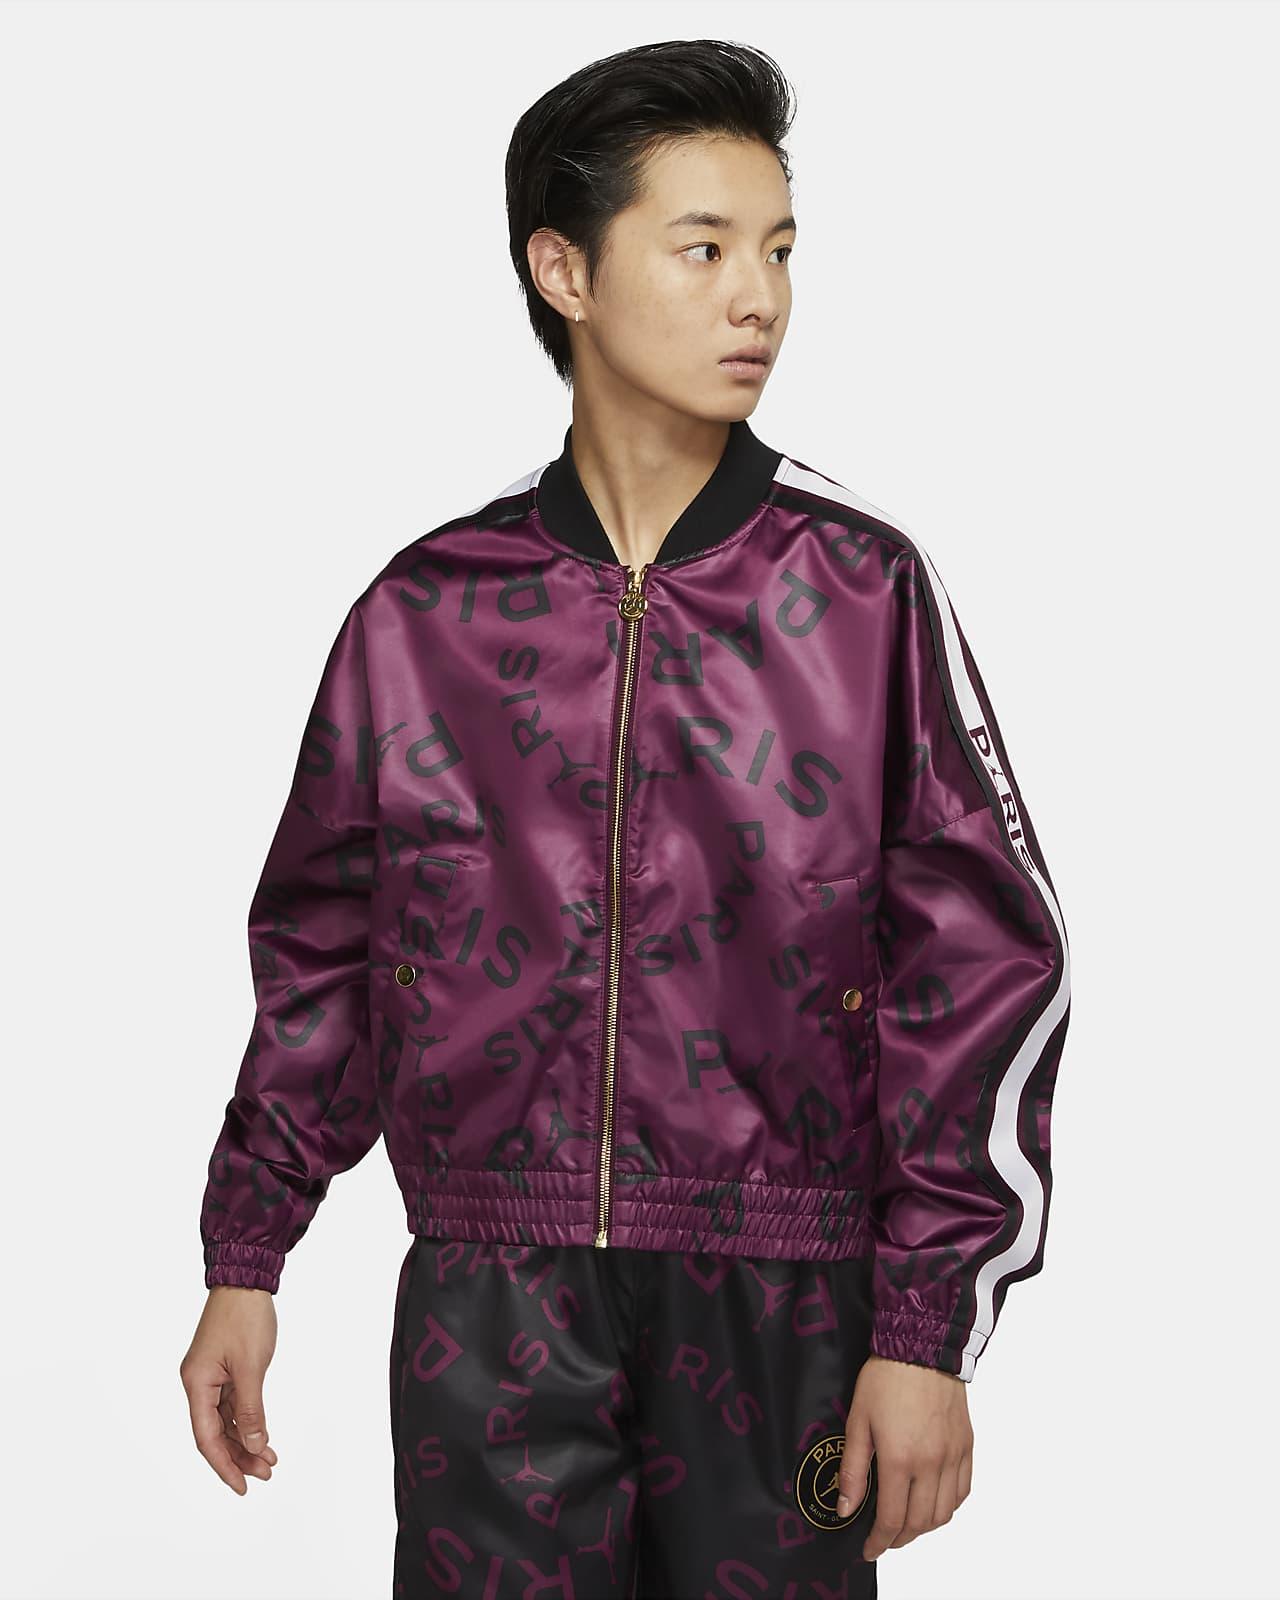 Paris Saint-Germain Women's Jacket